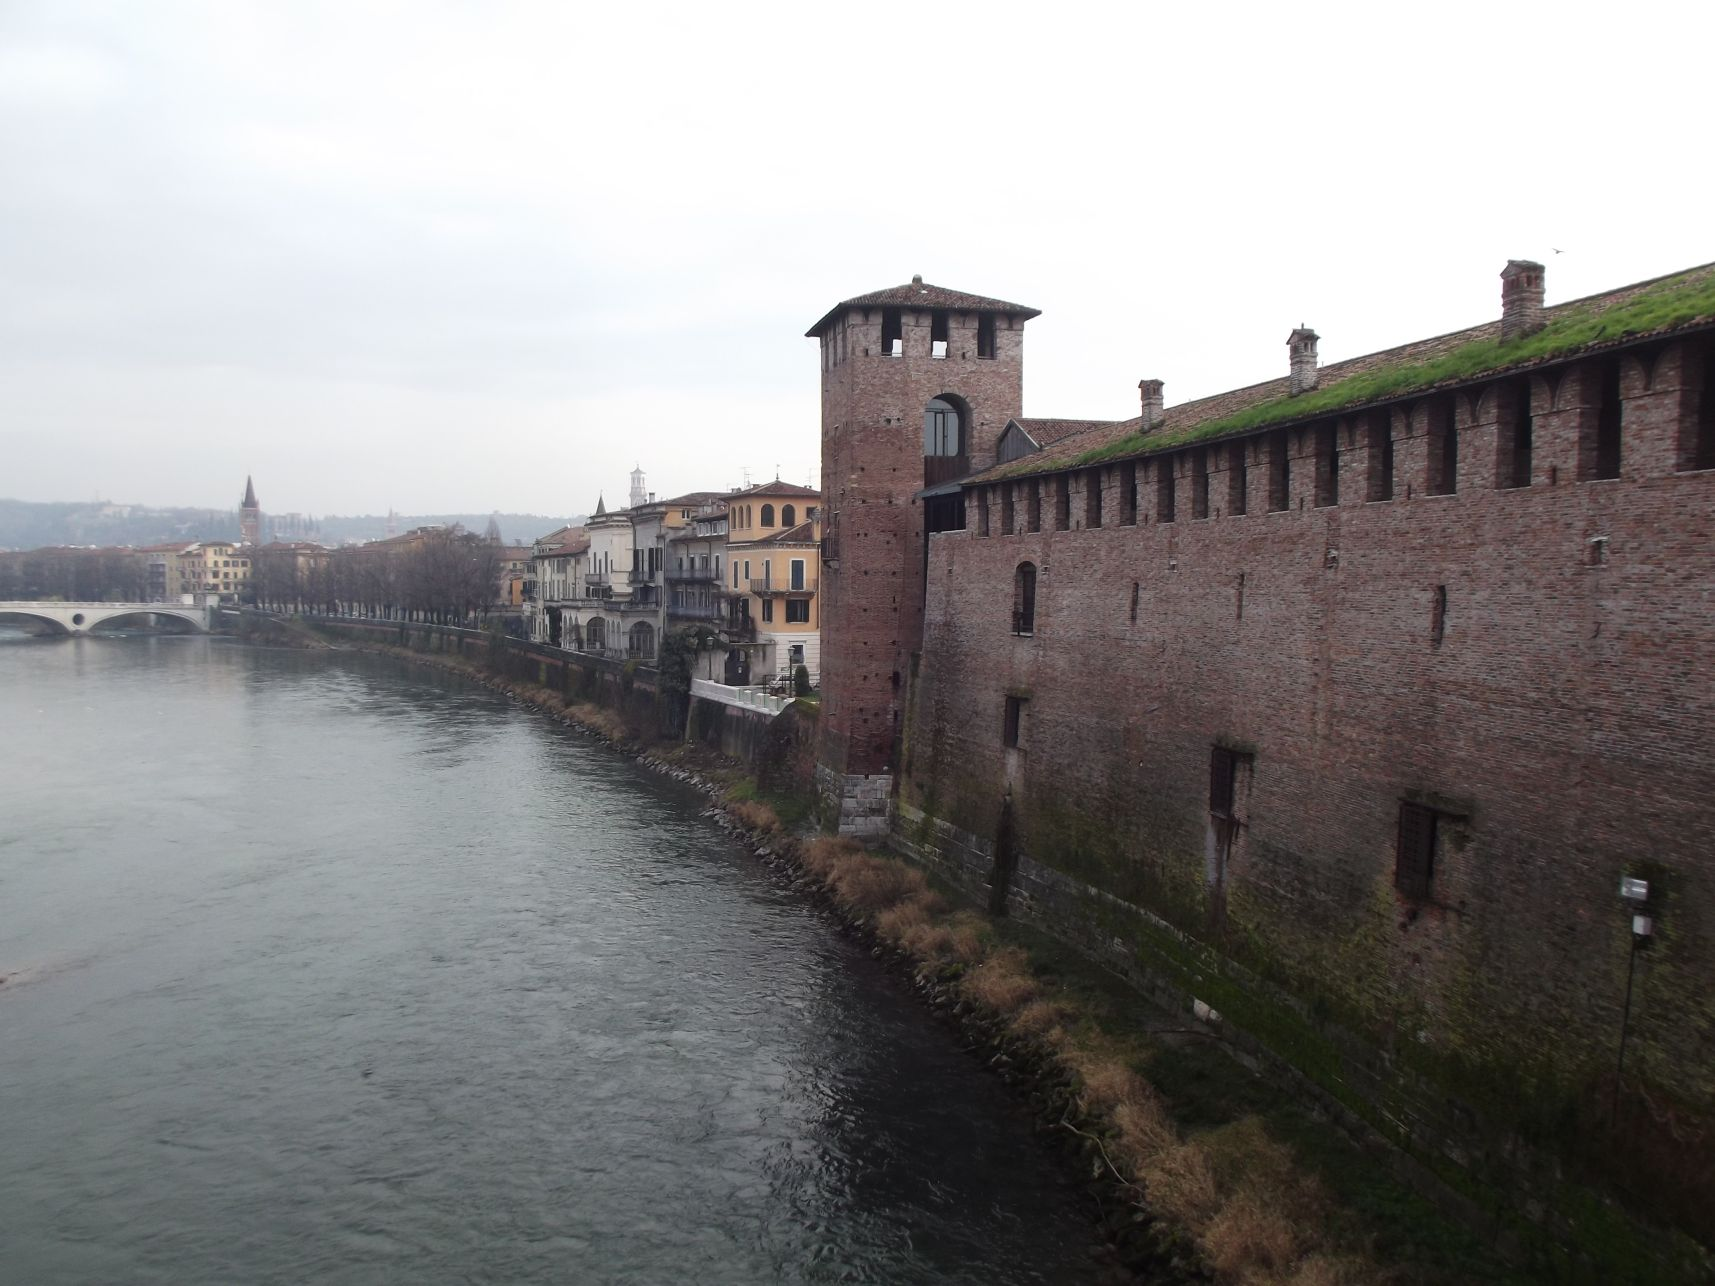 Castelvecchio a hídról